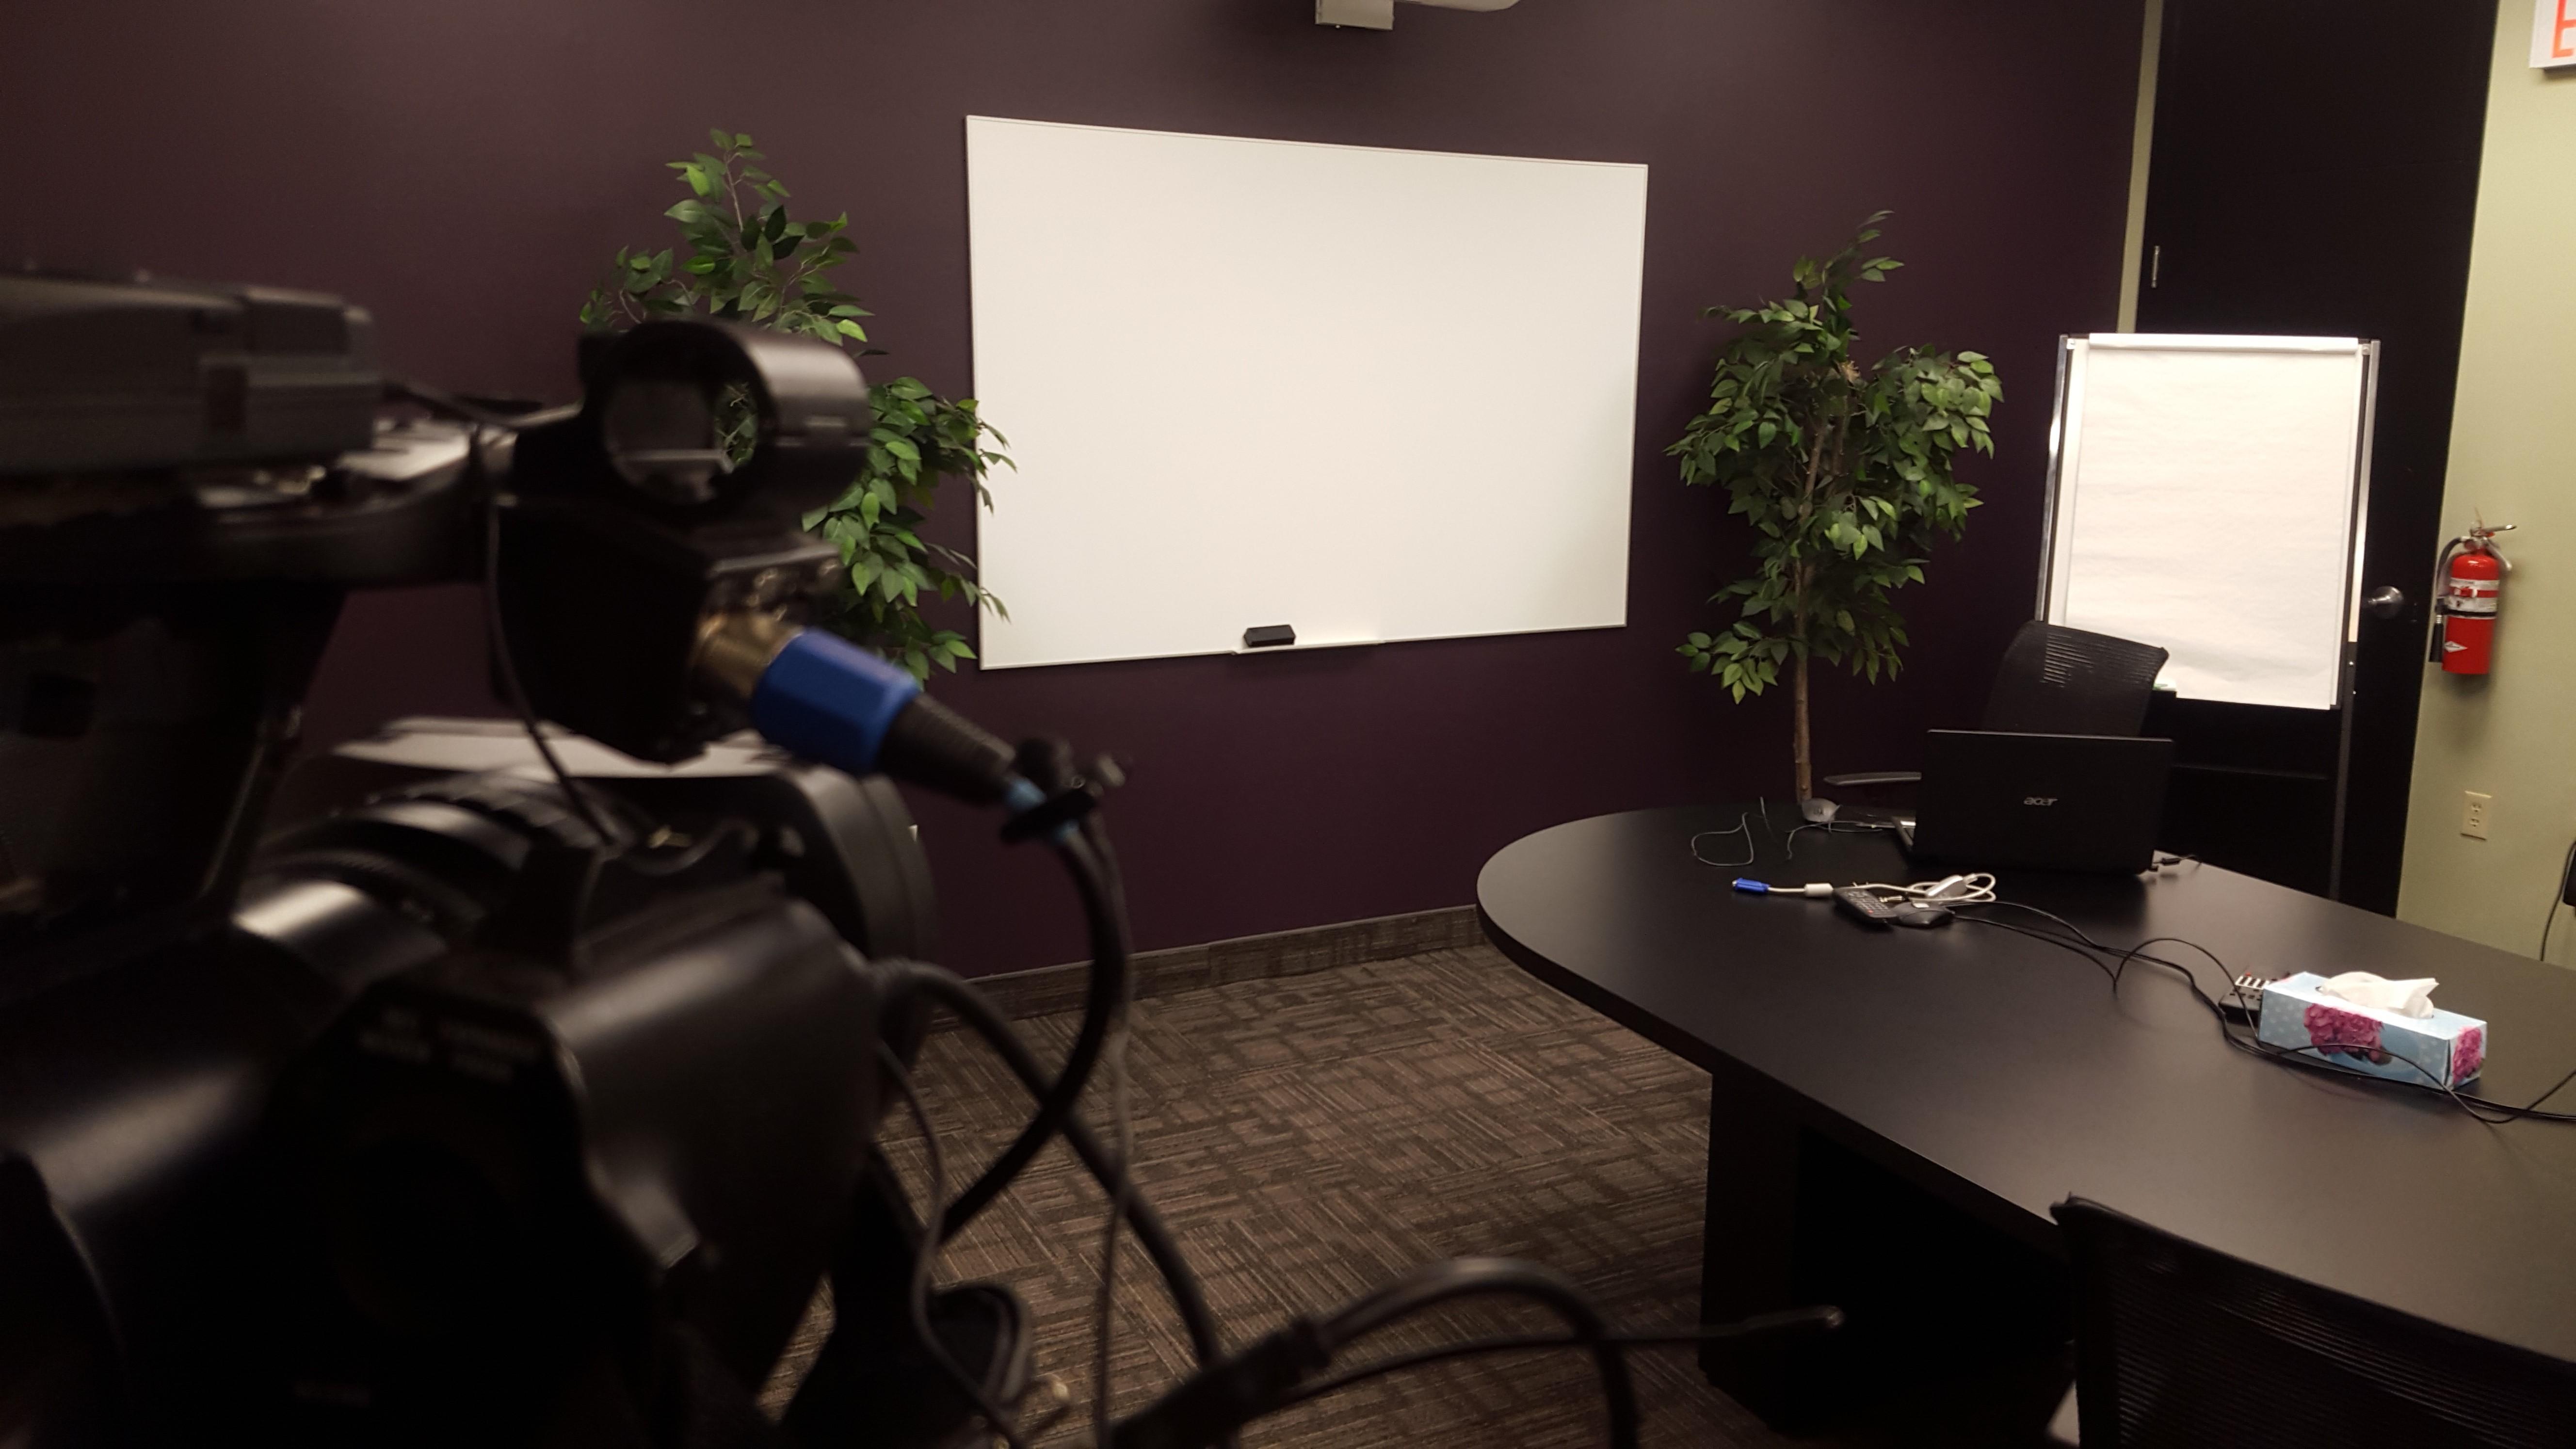 Webinars and Instructional videos